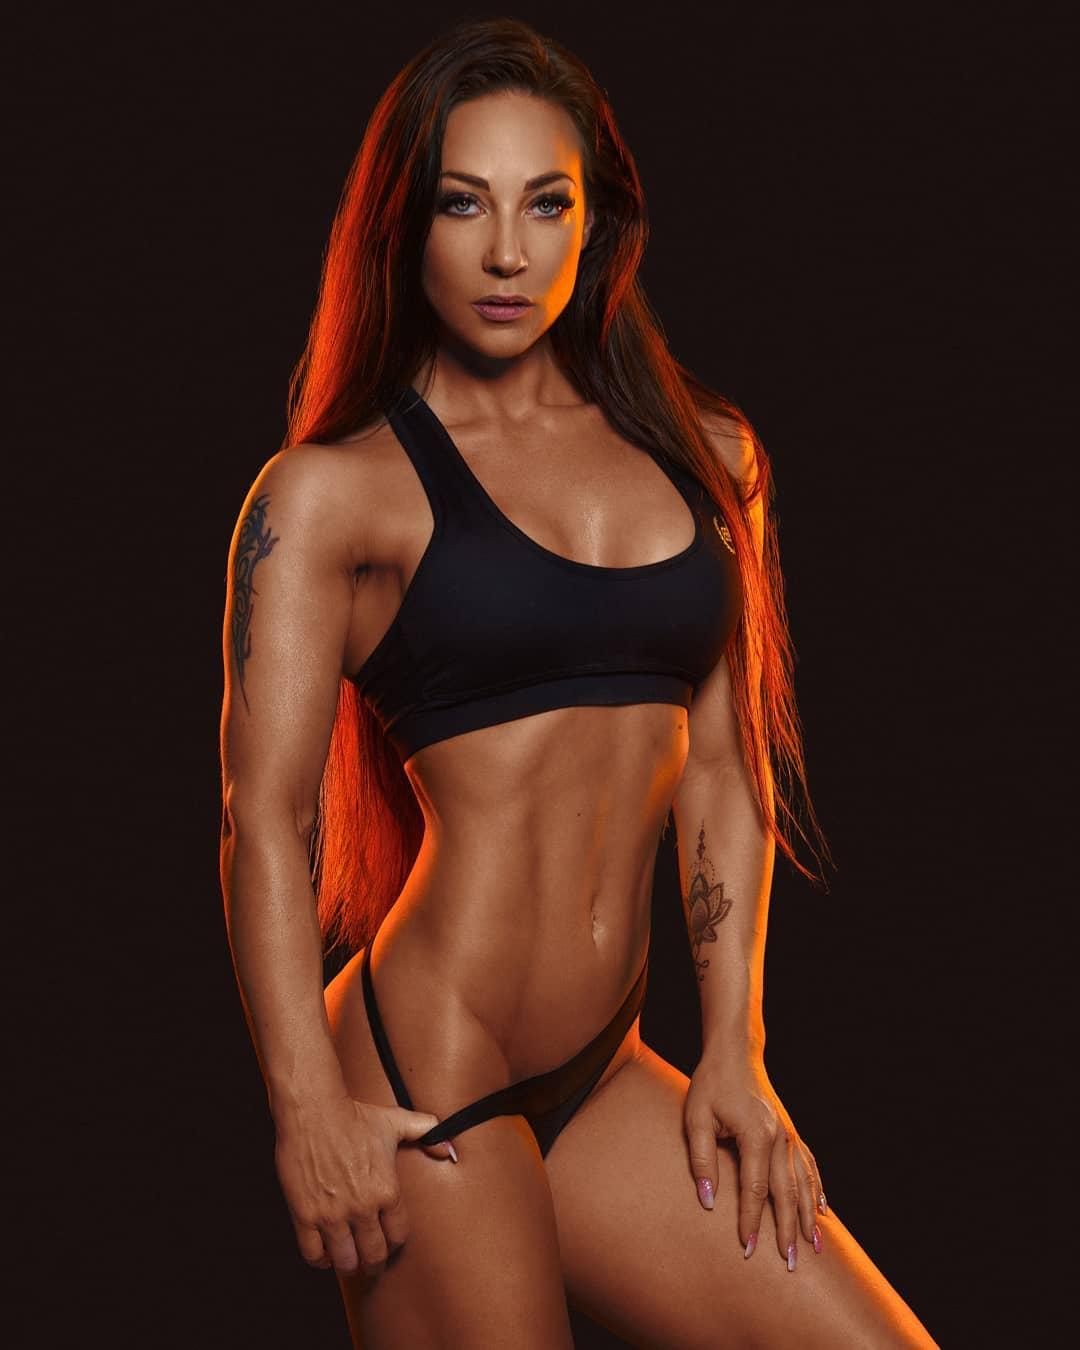 Anna Delyla